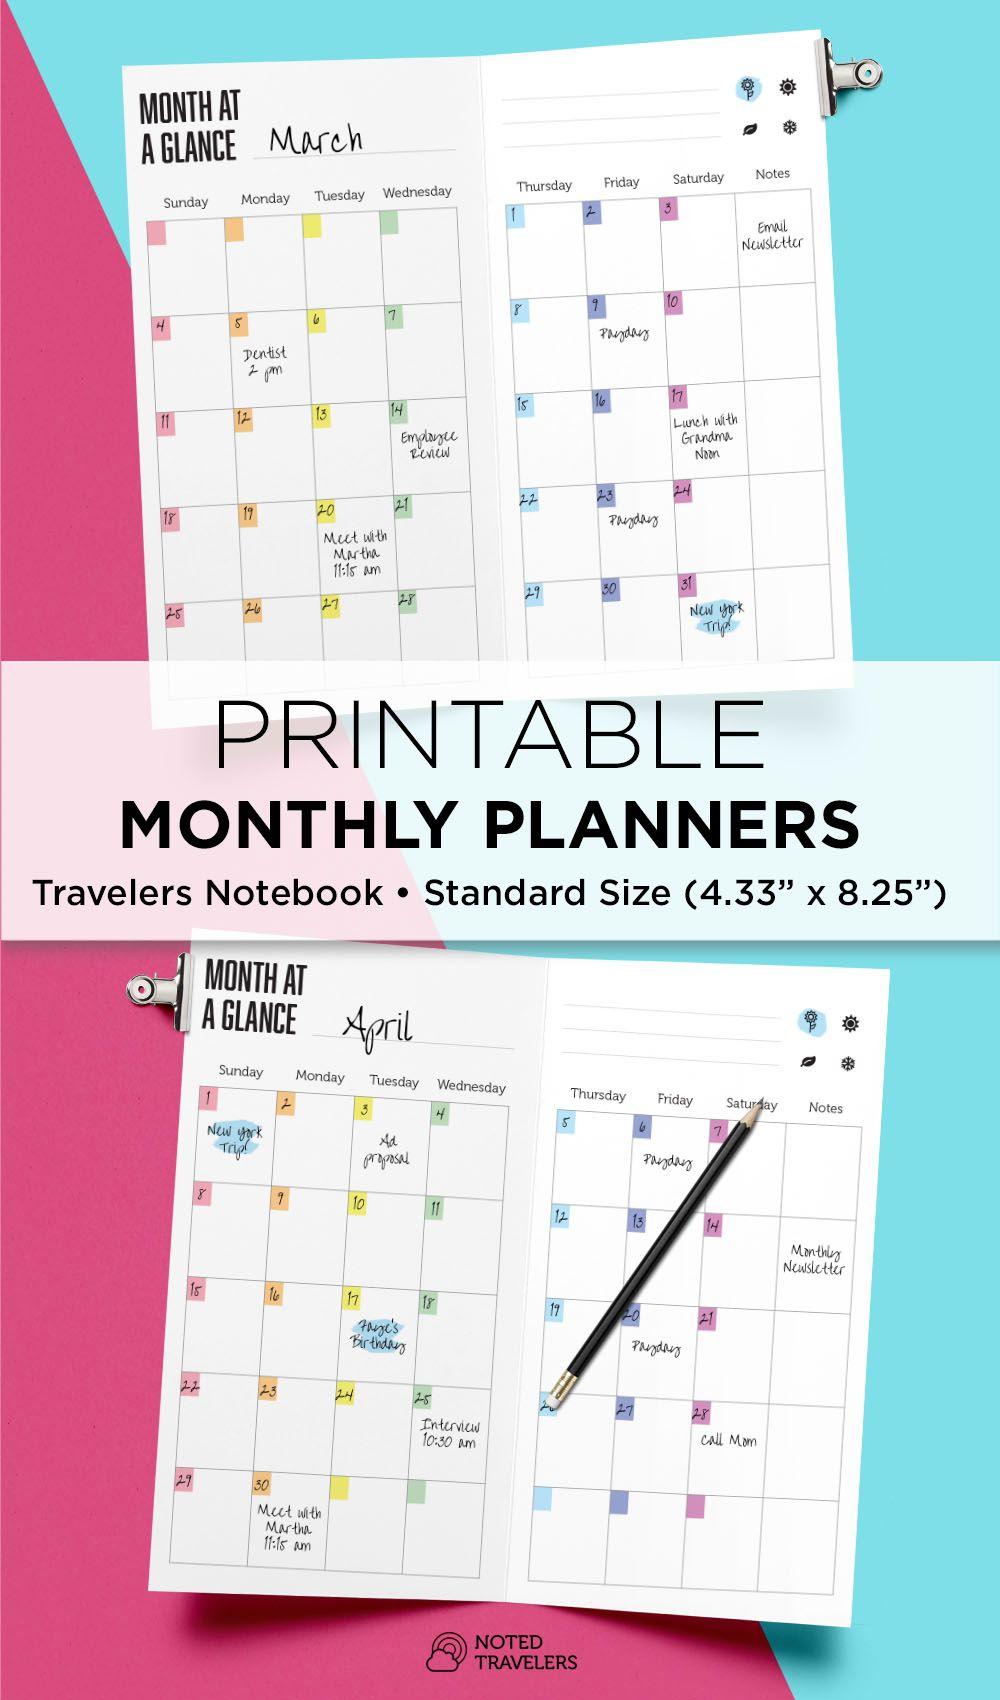 Rainbow Undated Monthly Planner, Travelers Notebook Standard